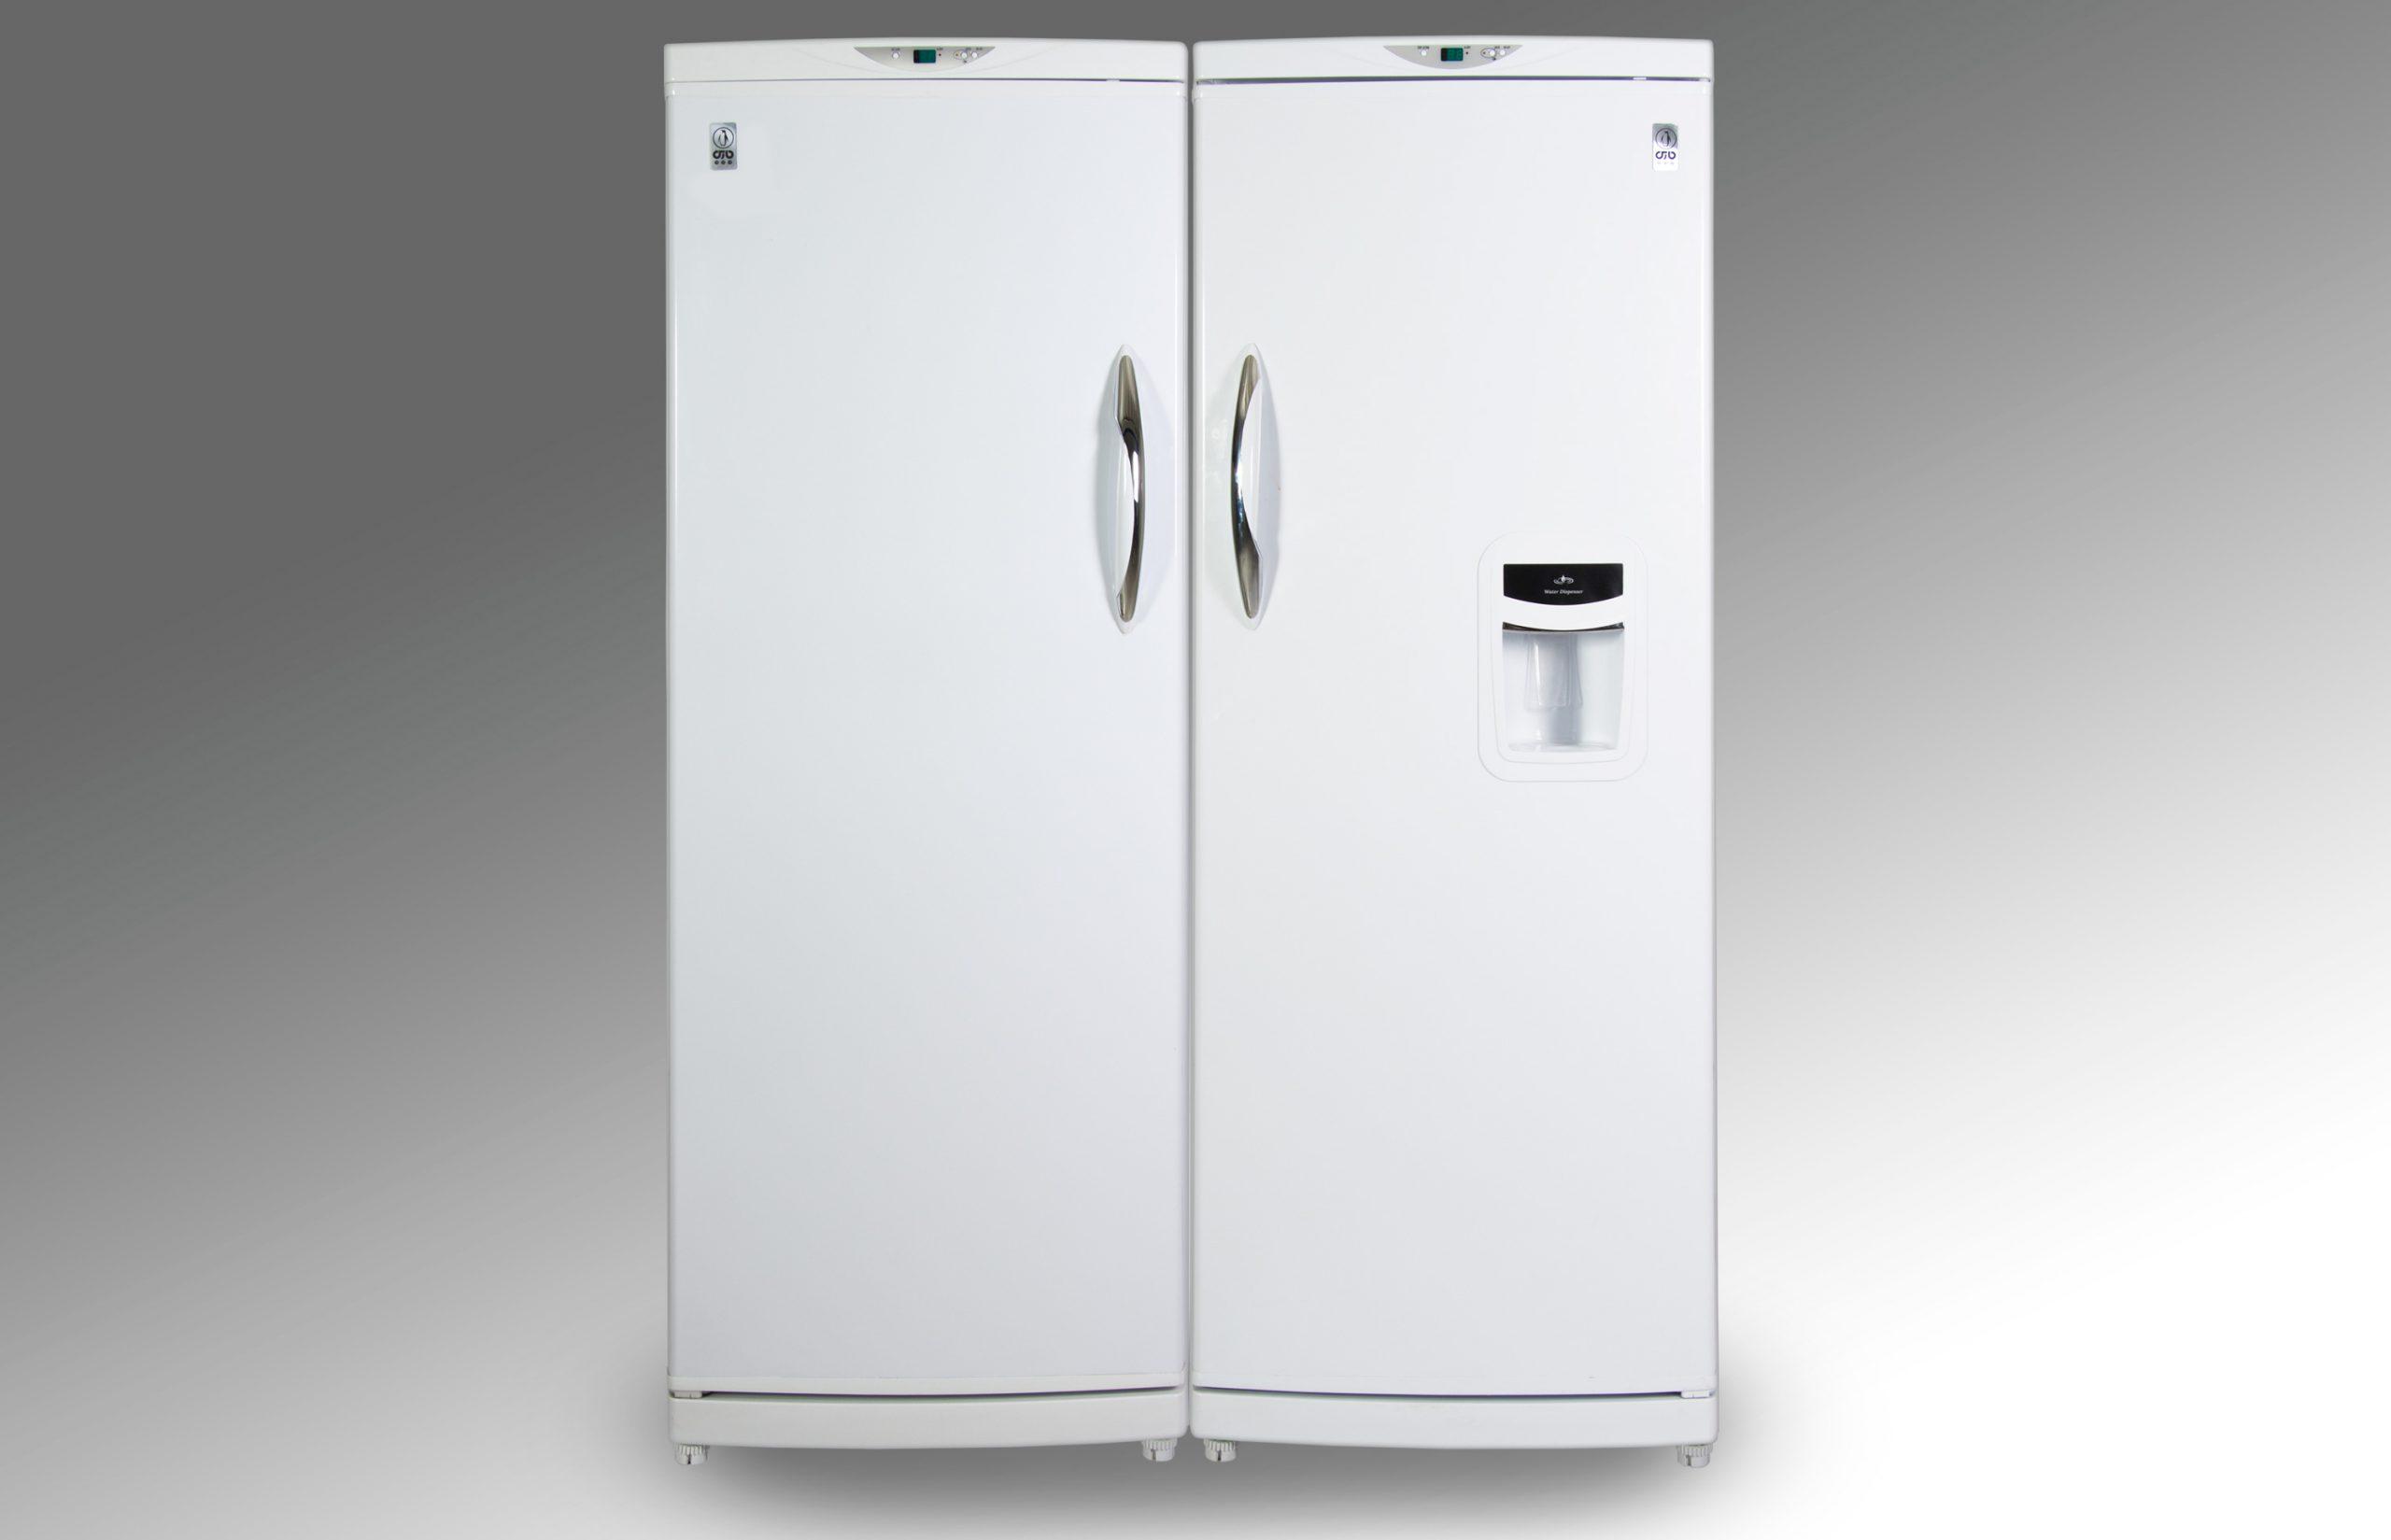 یخچال و فریزر دوقلوی پارس مدل LRDST170WD-FRZNF170